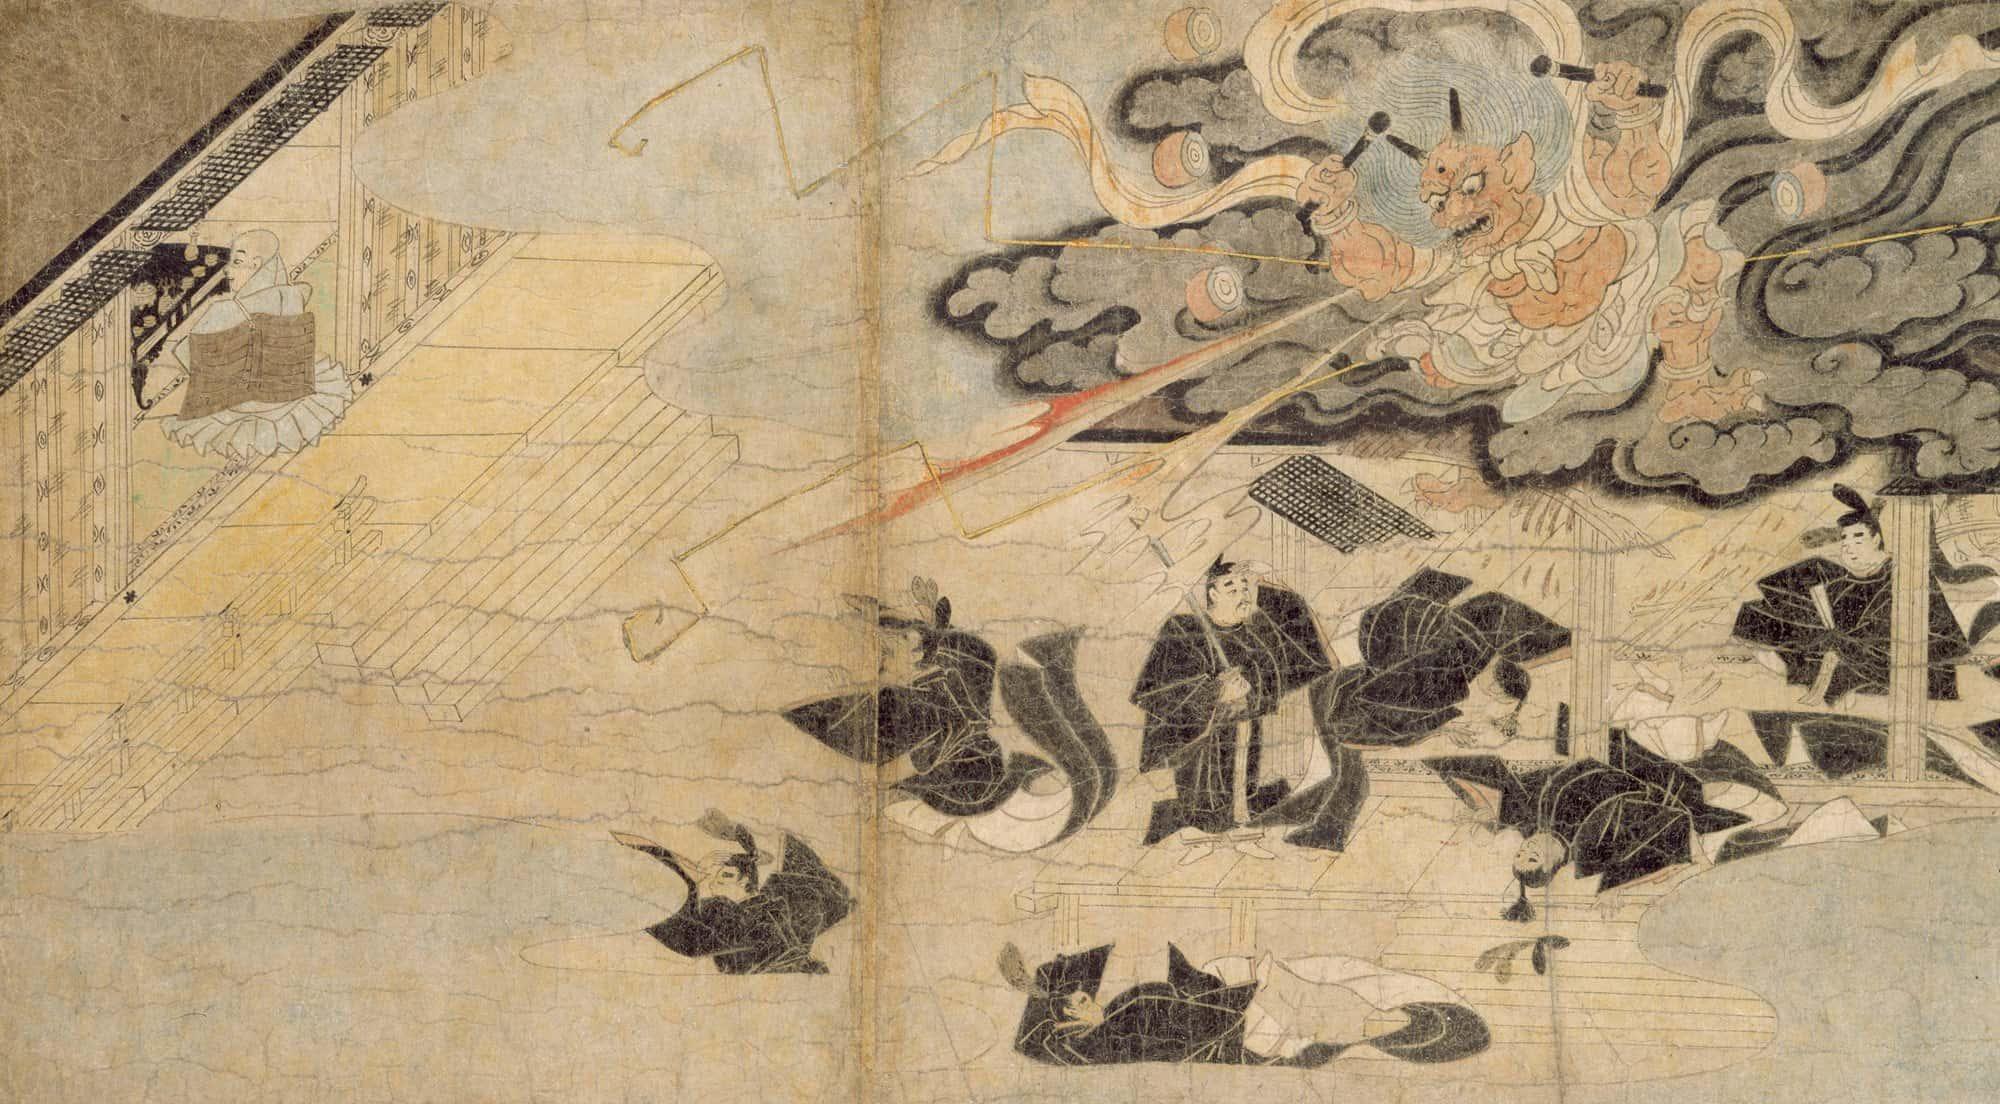 japanese history essays